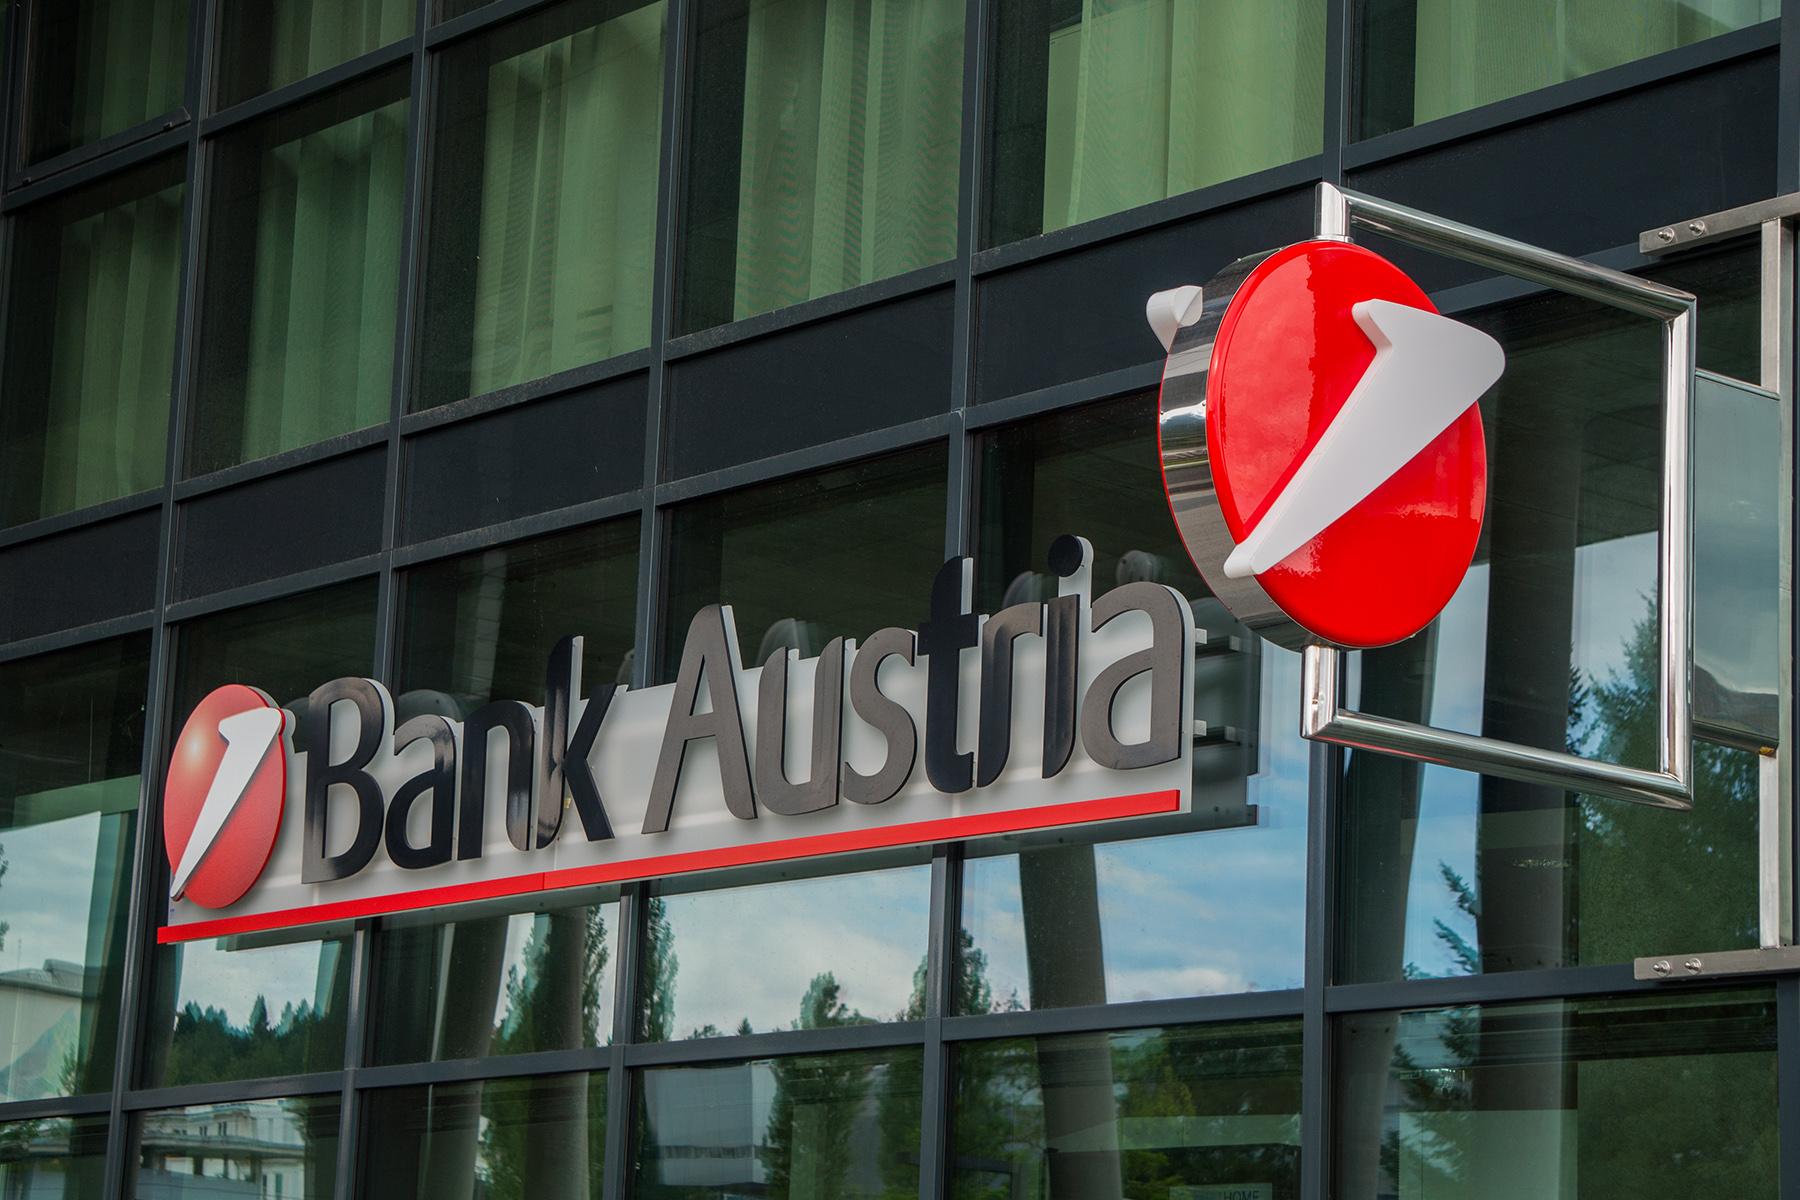 Bank Austria branch